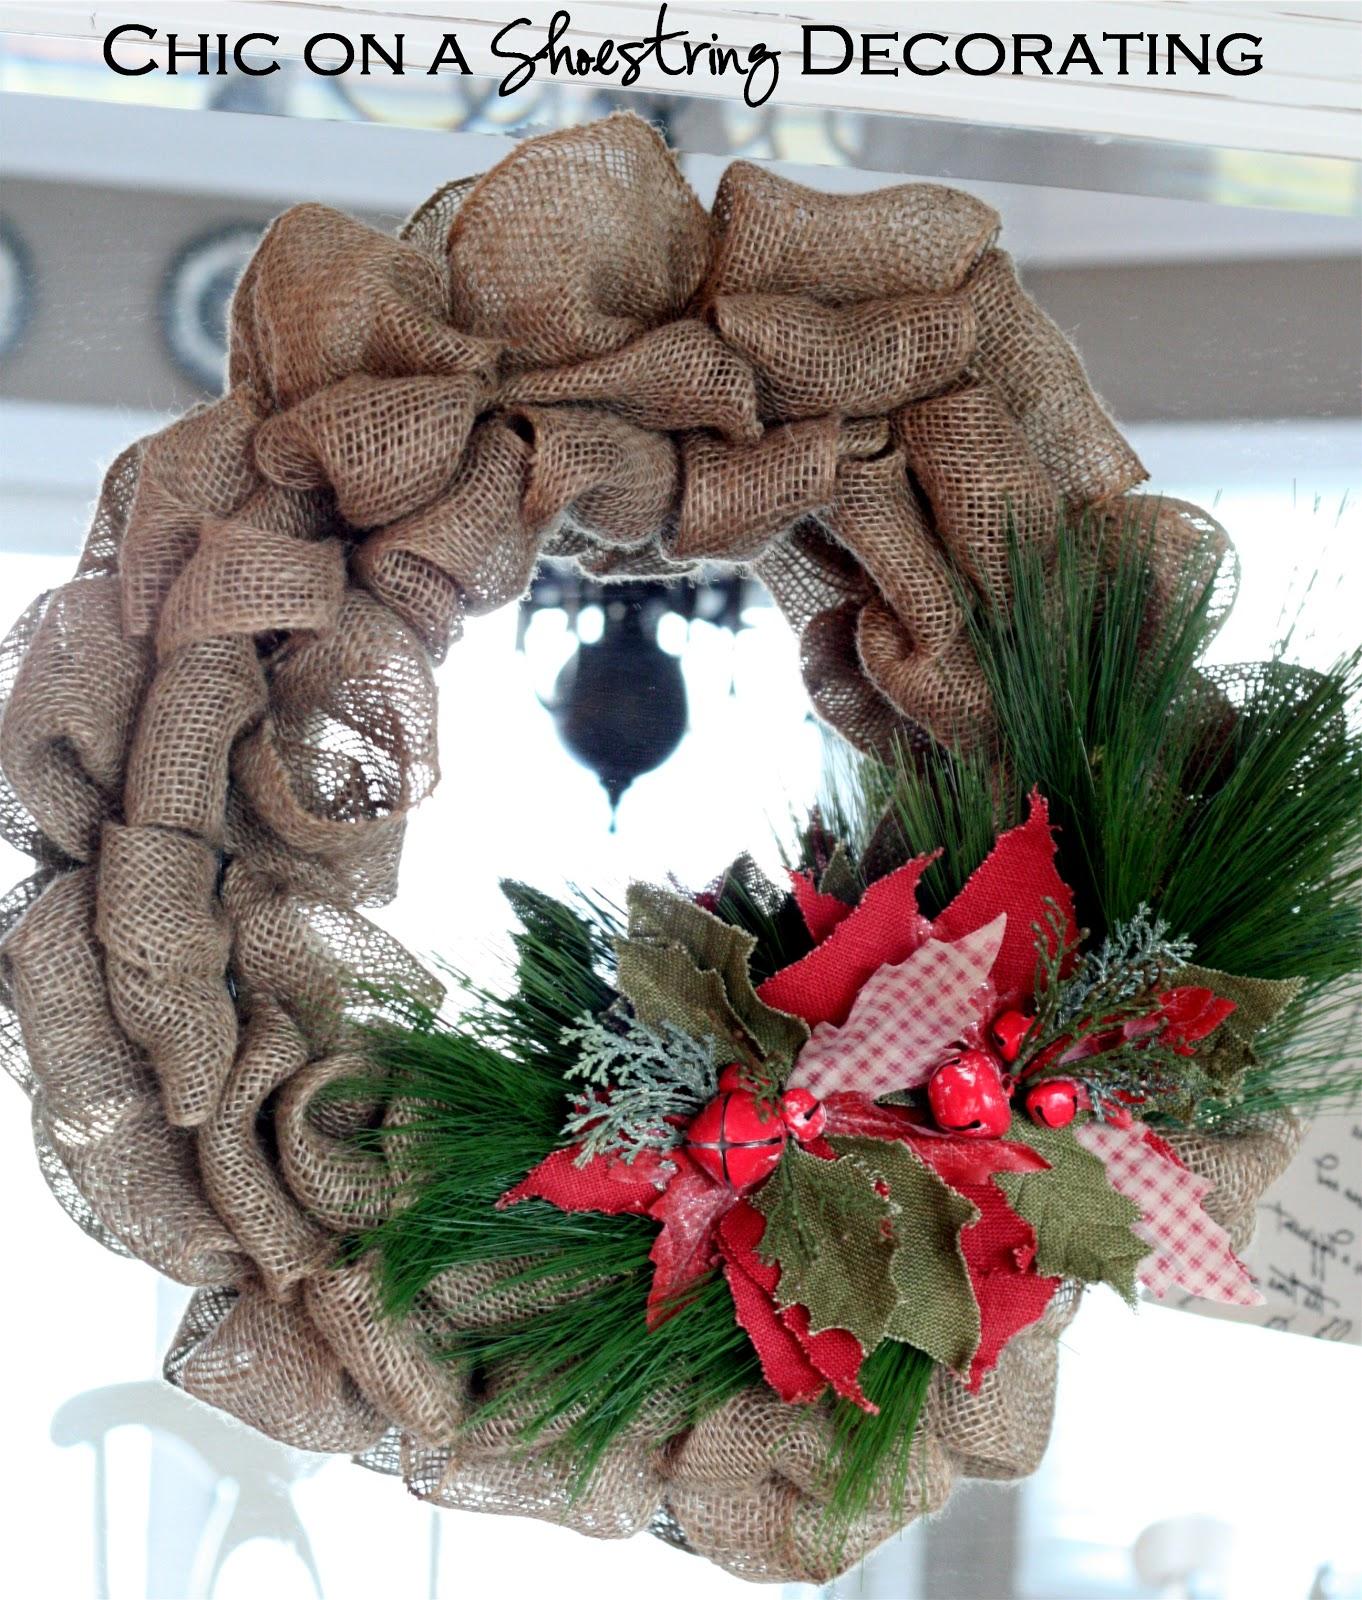 DIY Burlap Christmas Wreath